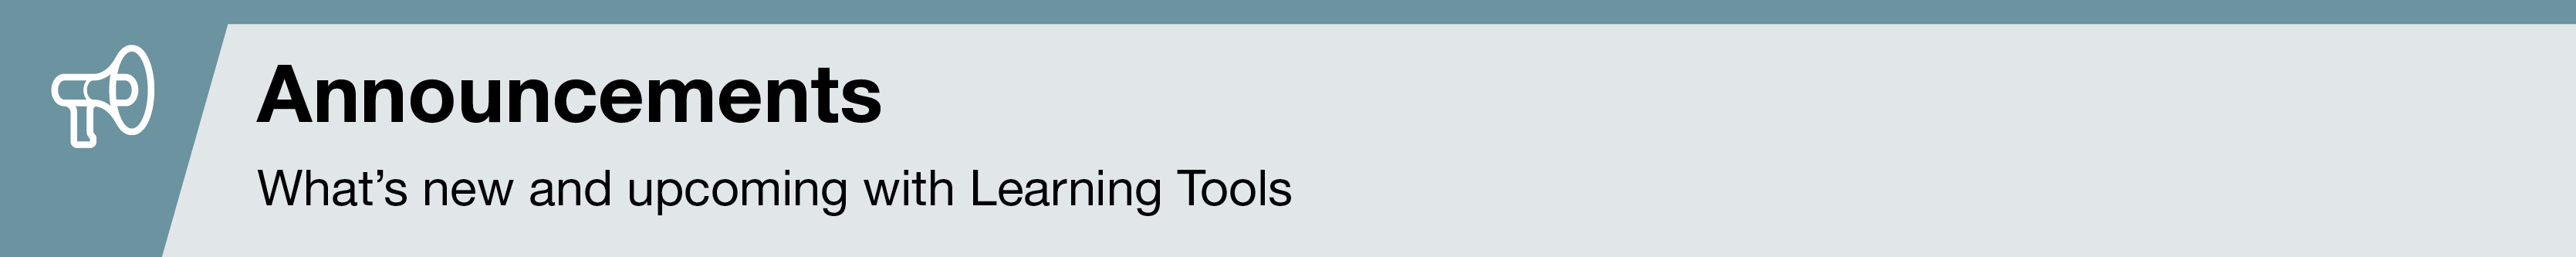 LearningTools_Announcements_SectionHead_801x80